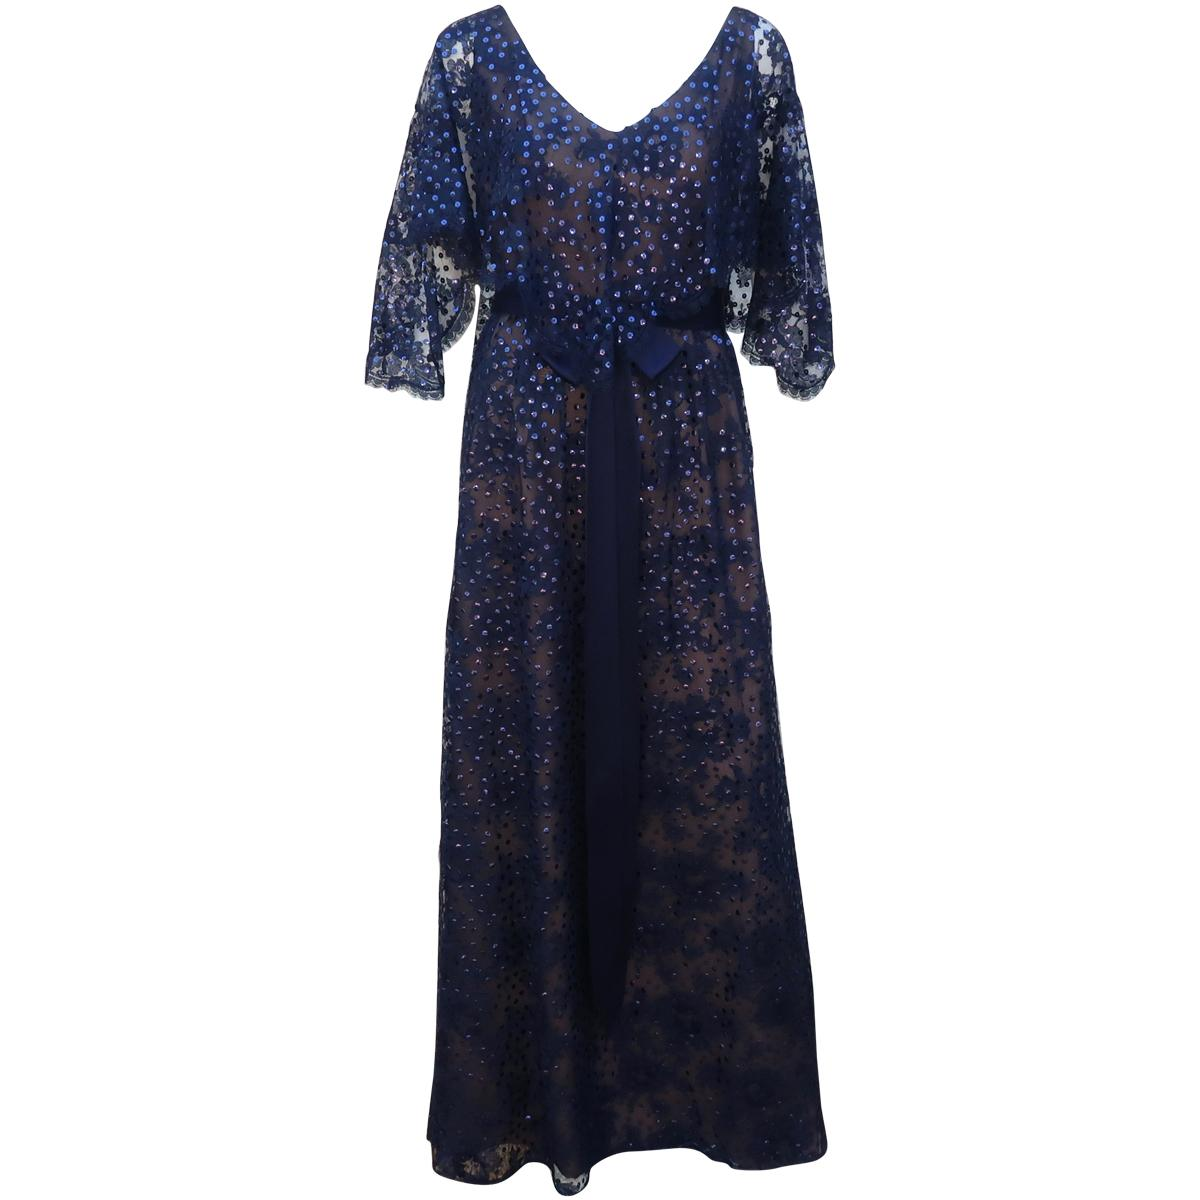 Kiki Hart Blue Lace Sequin Evening Dress, 1960's